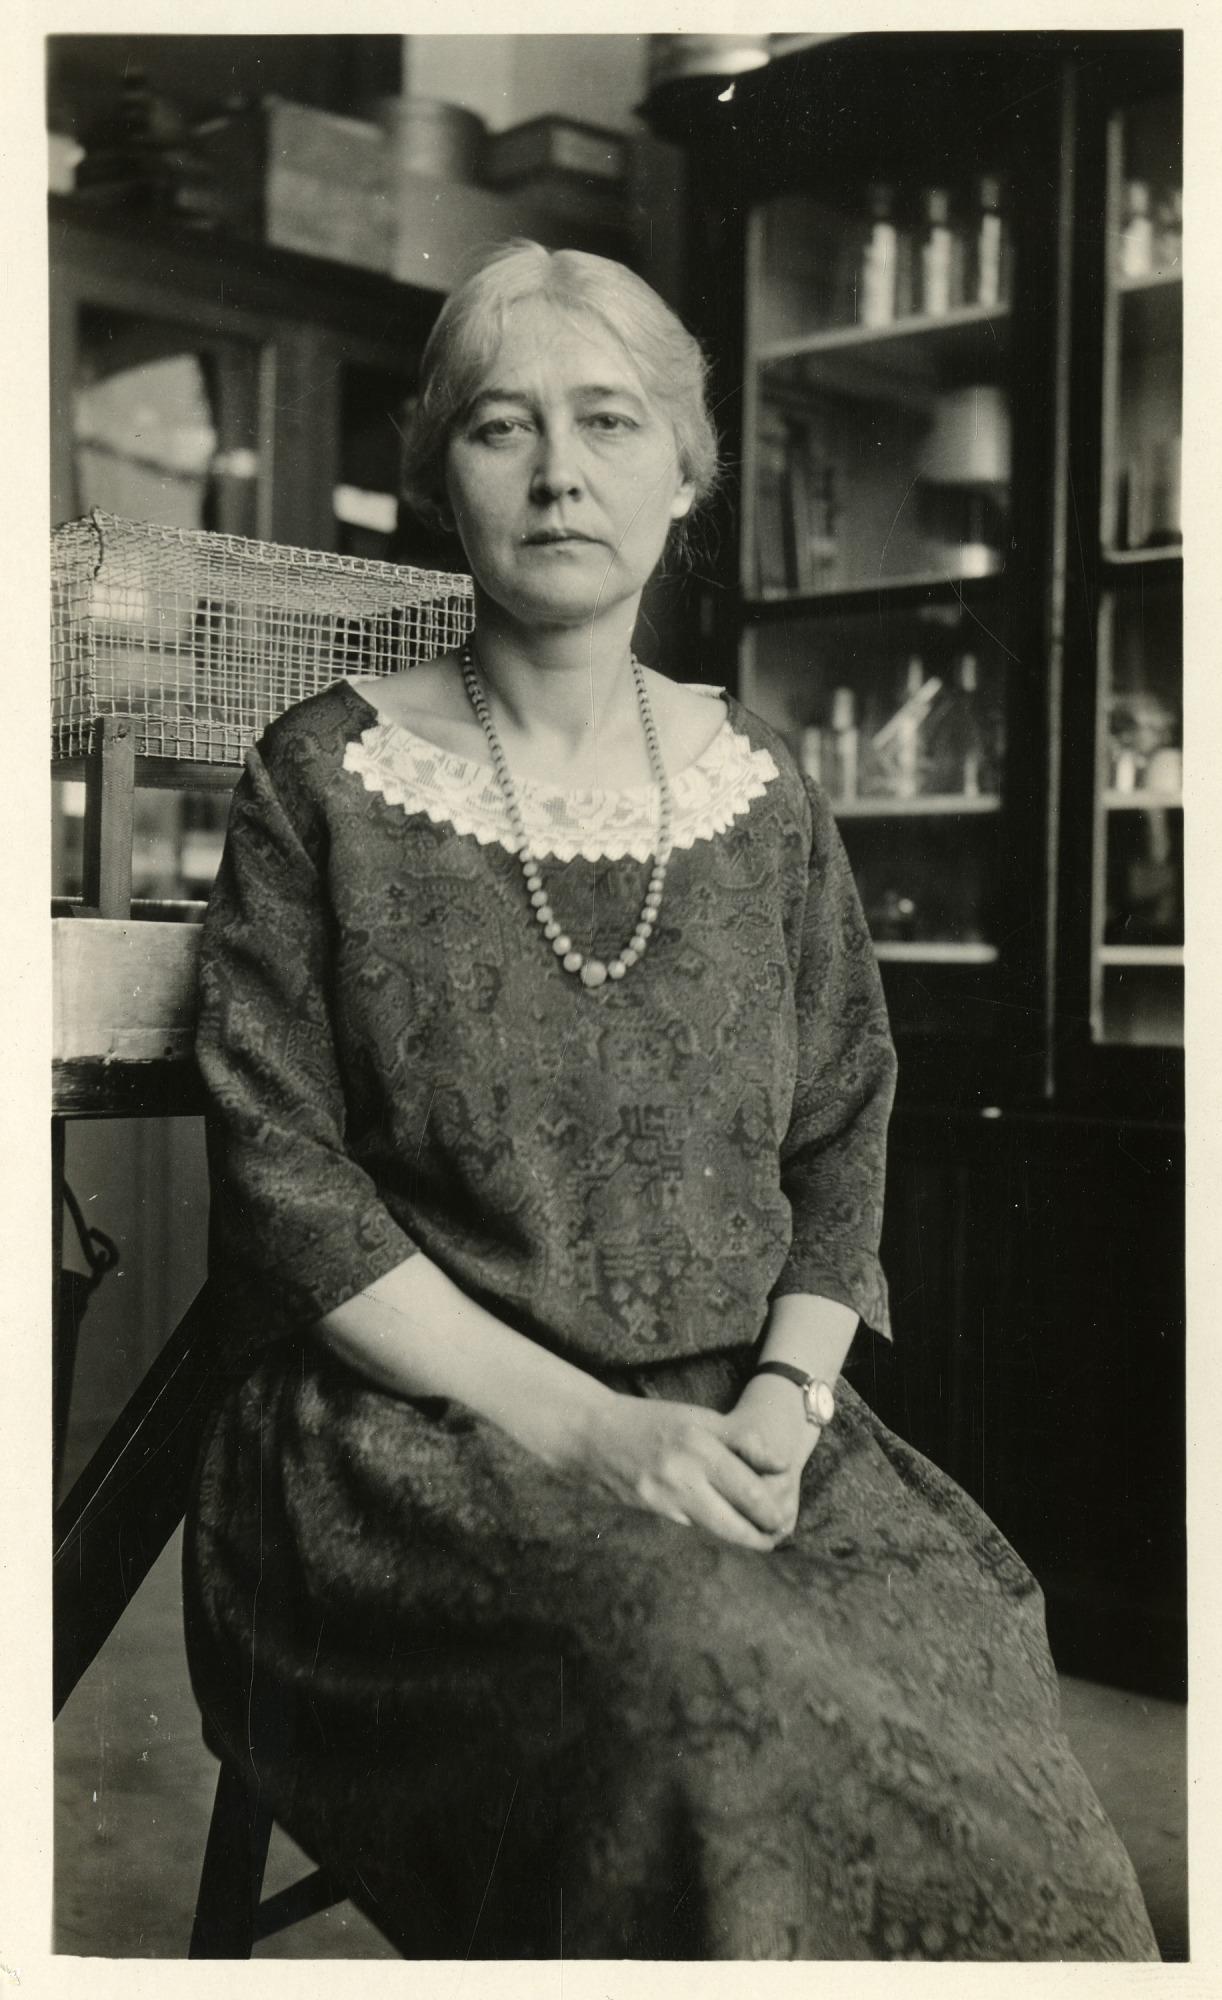 Maud Leonora Menten (1879-1960), Smithsonian Institution Archives, SIA Acc. 90-105 [SIA2008-5999].